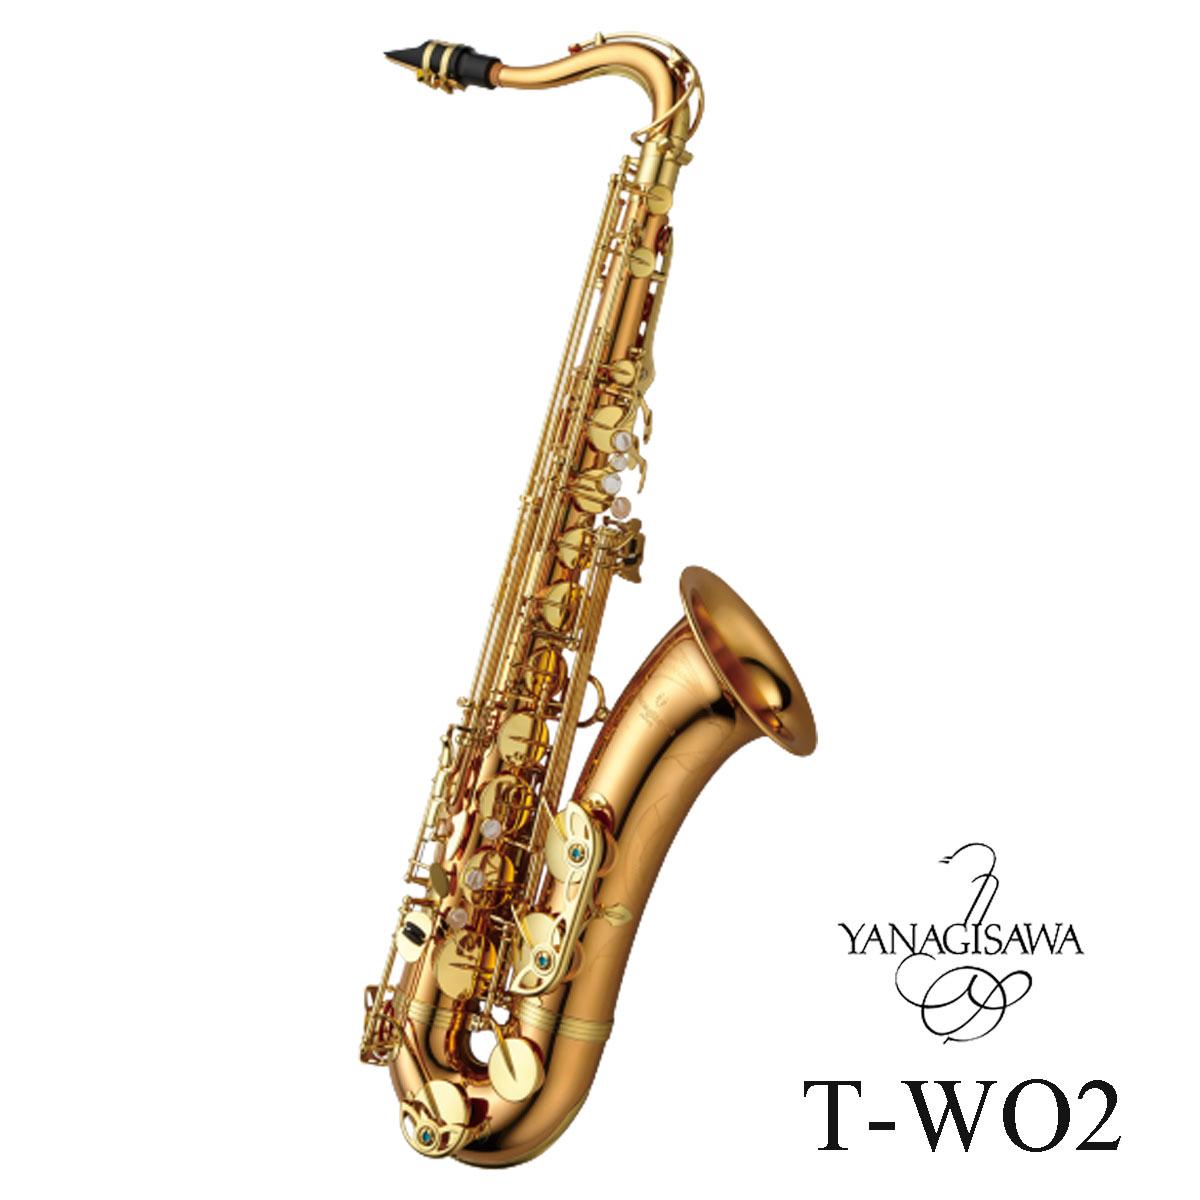 Yanagisawa TENOR SAXOPHONE T-WO2 ヤナギサワ テナーサックス ダブルオーシリーズ【ご予約受付中/納期ご相談ください】【5年保証】